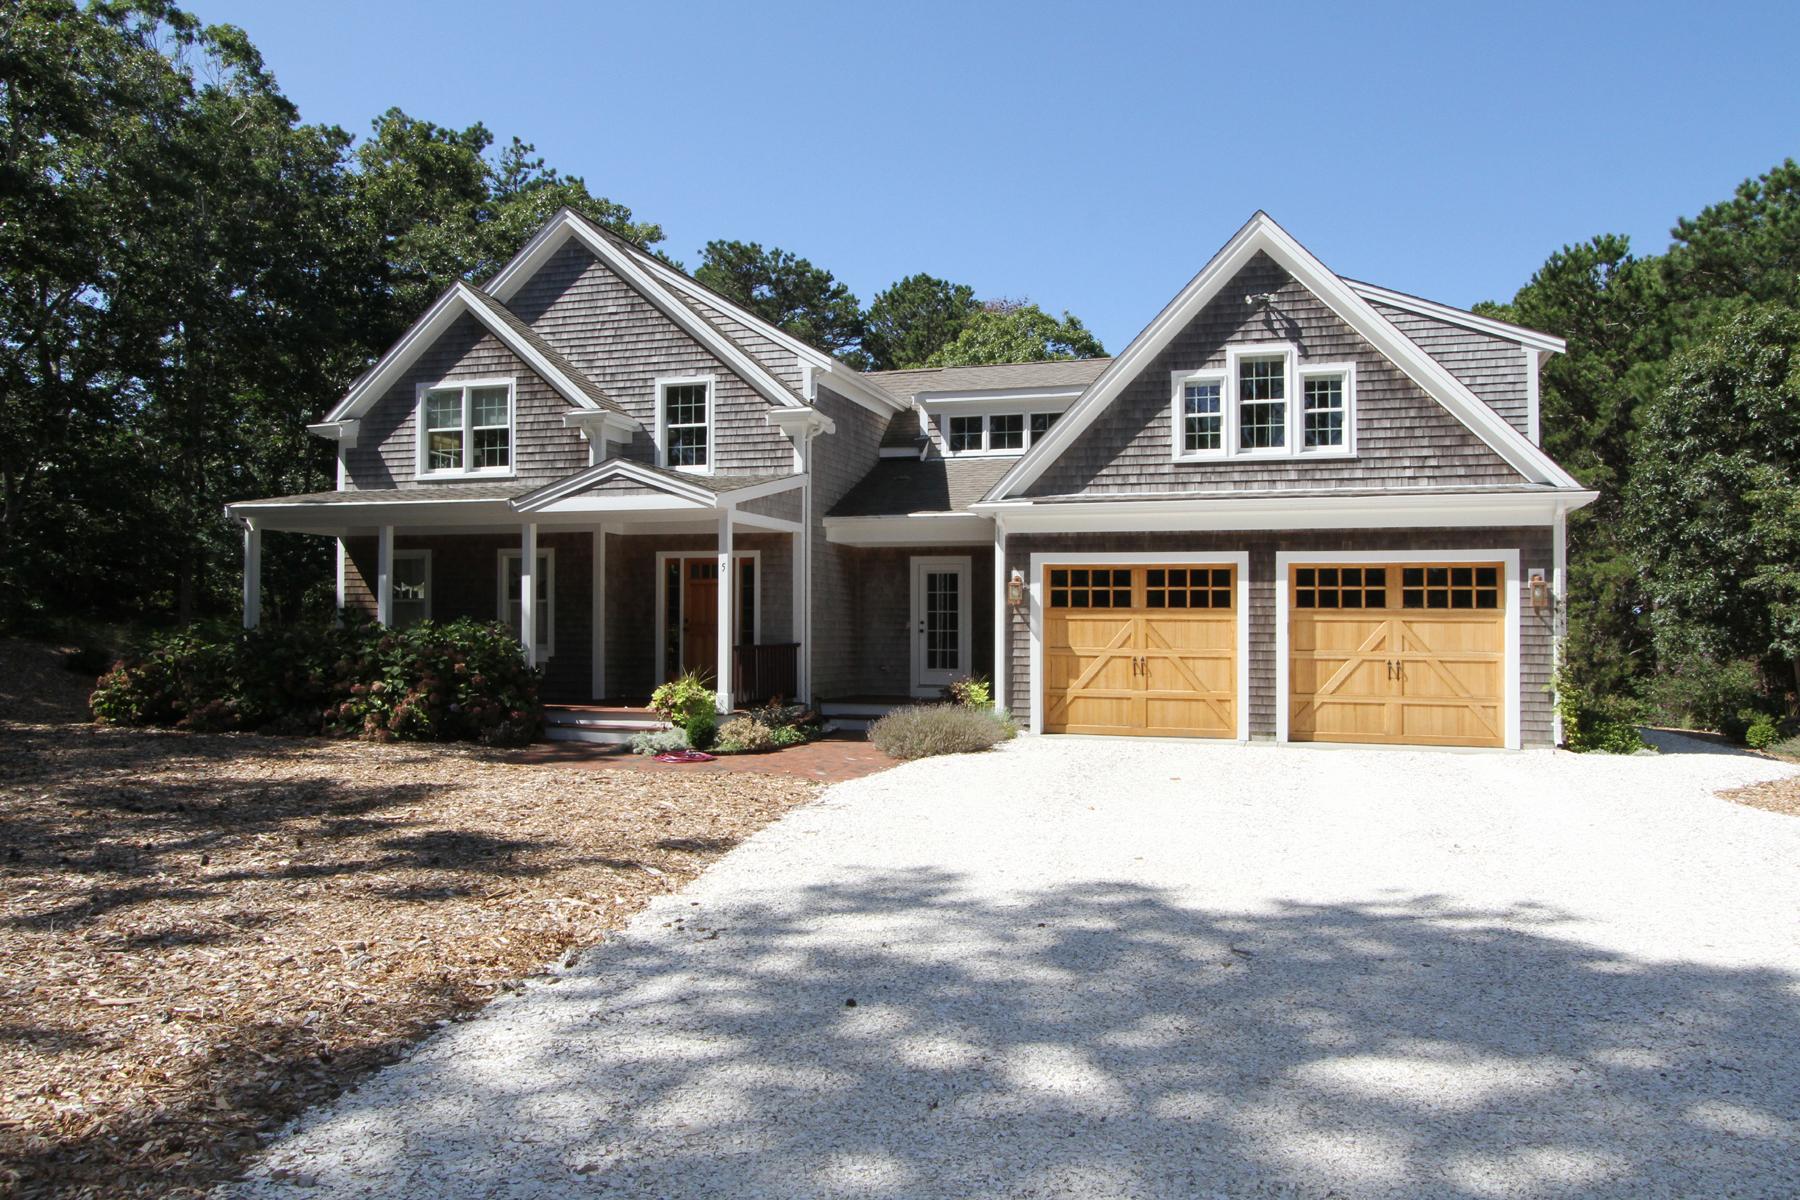 sales property at 10 Diamondback Way, Wellfleet, MA